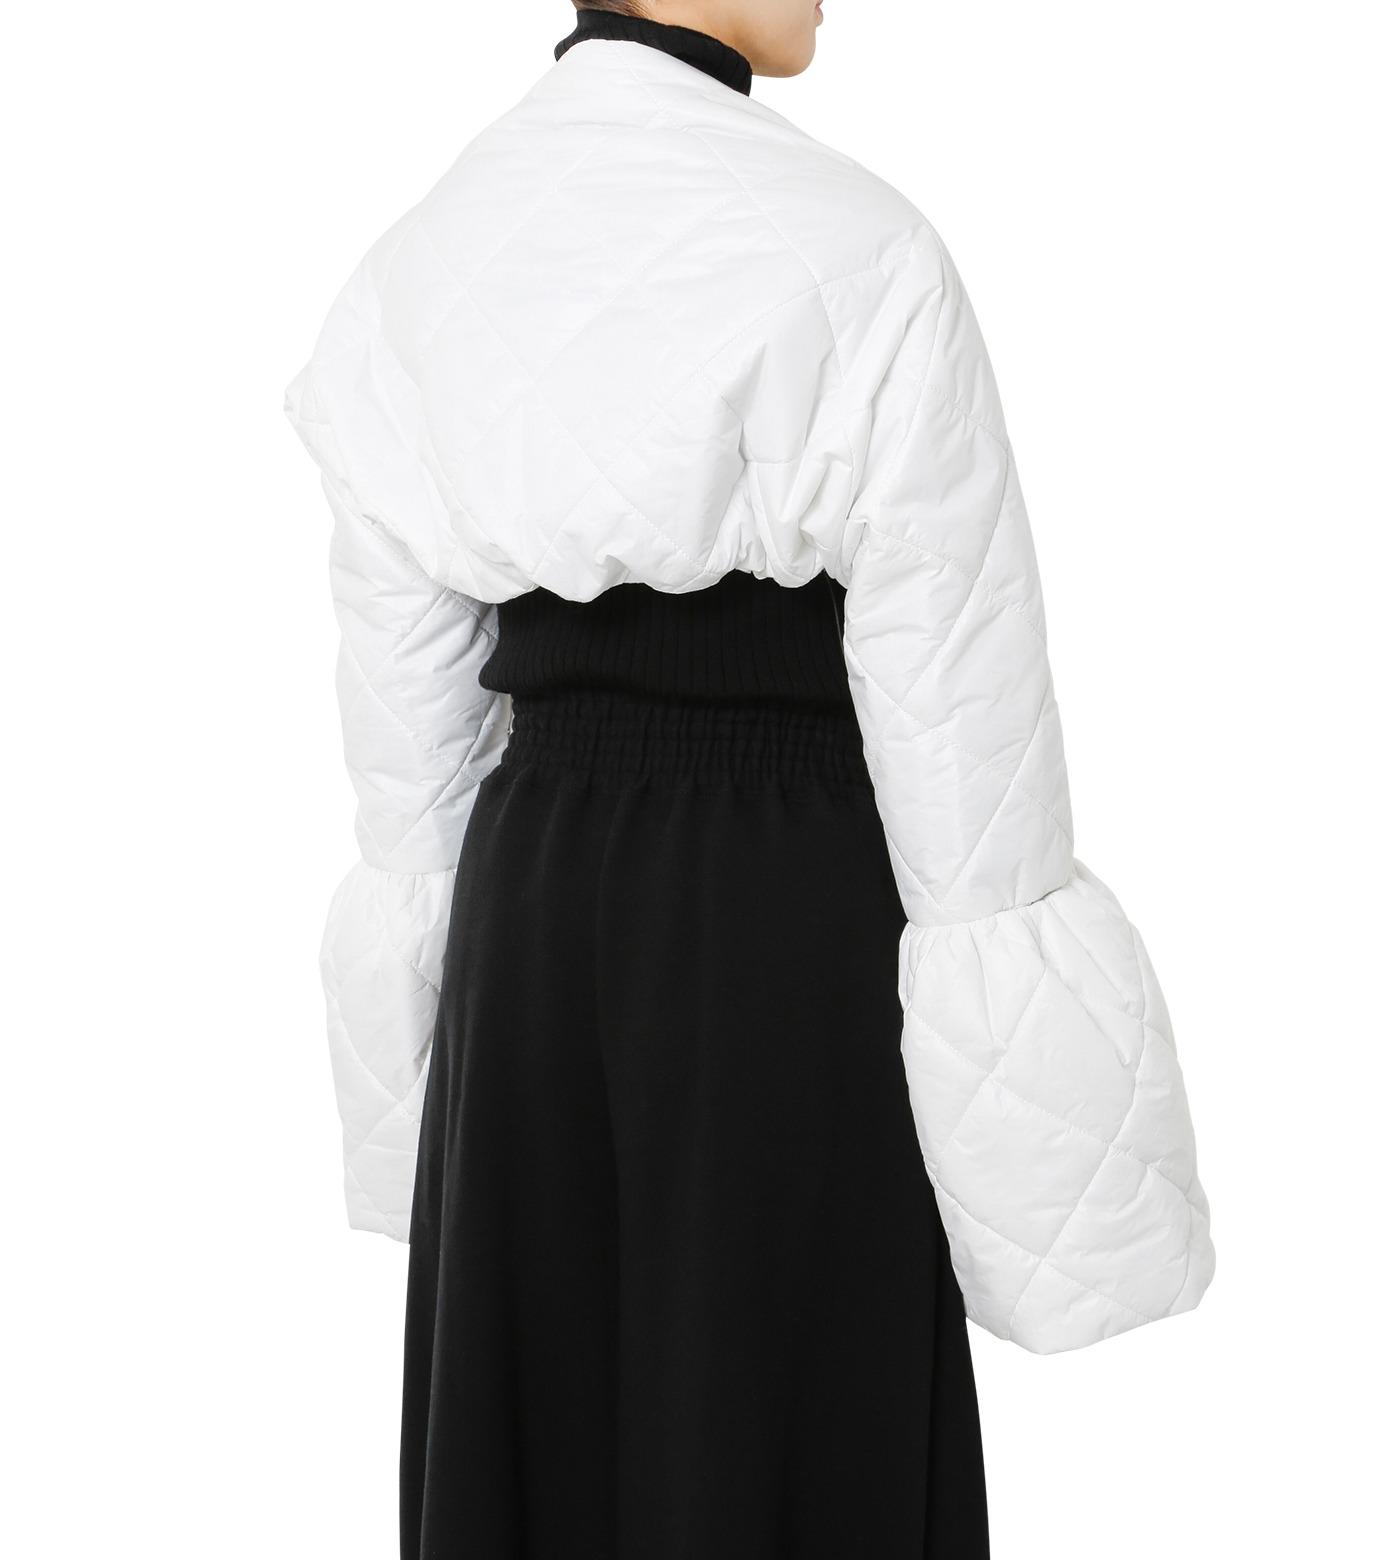 LE CIEL BLEU(ルシェルブルー)のキルティングマフラー-WHITE(アクセサリー/accessory)-18A60604 拡大詳細画像3